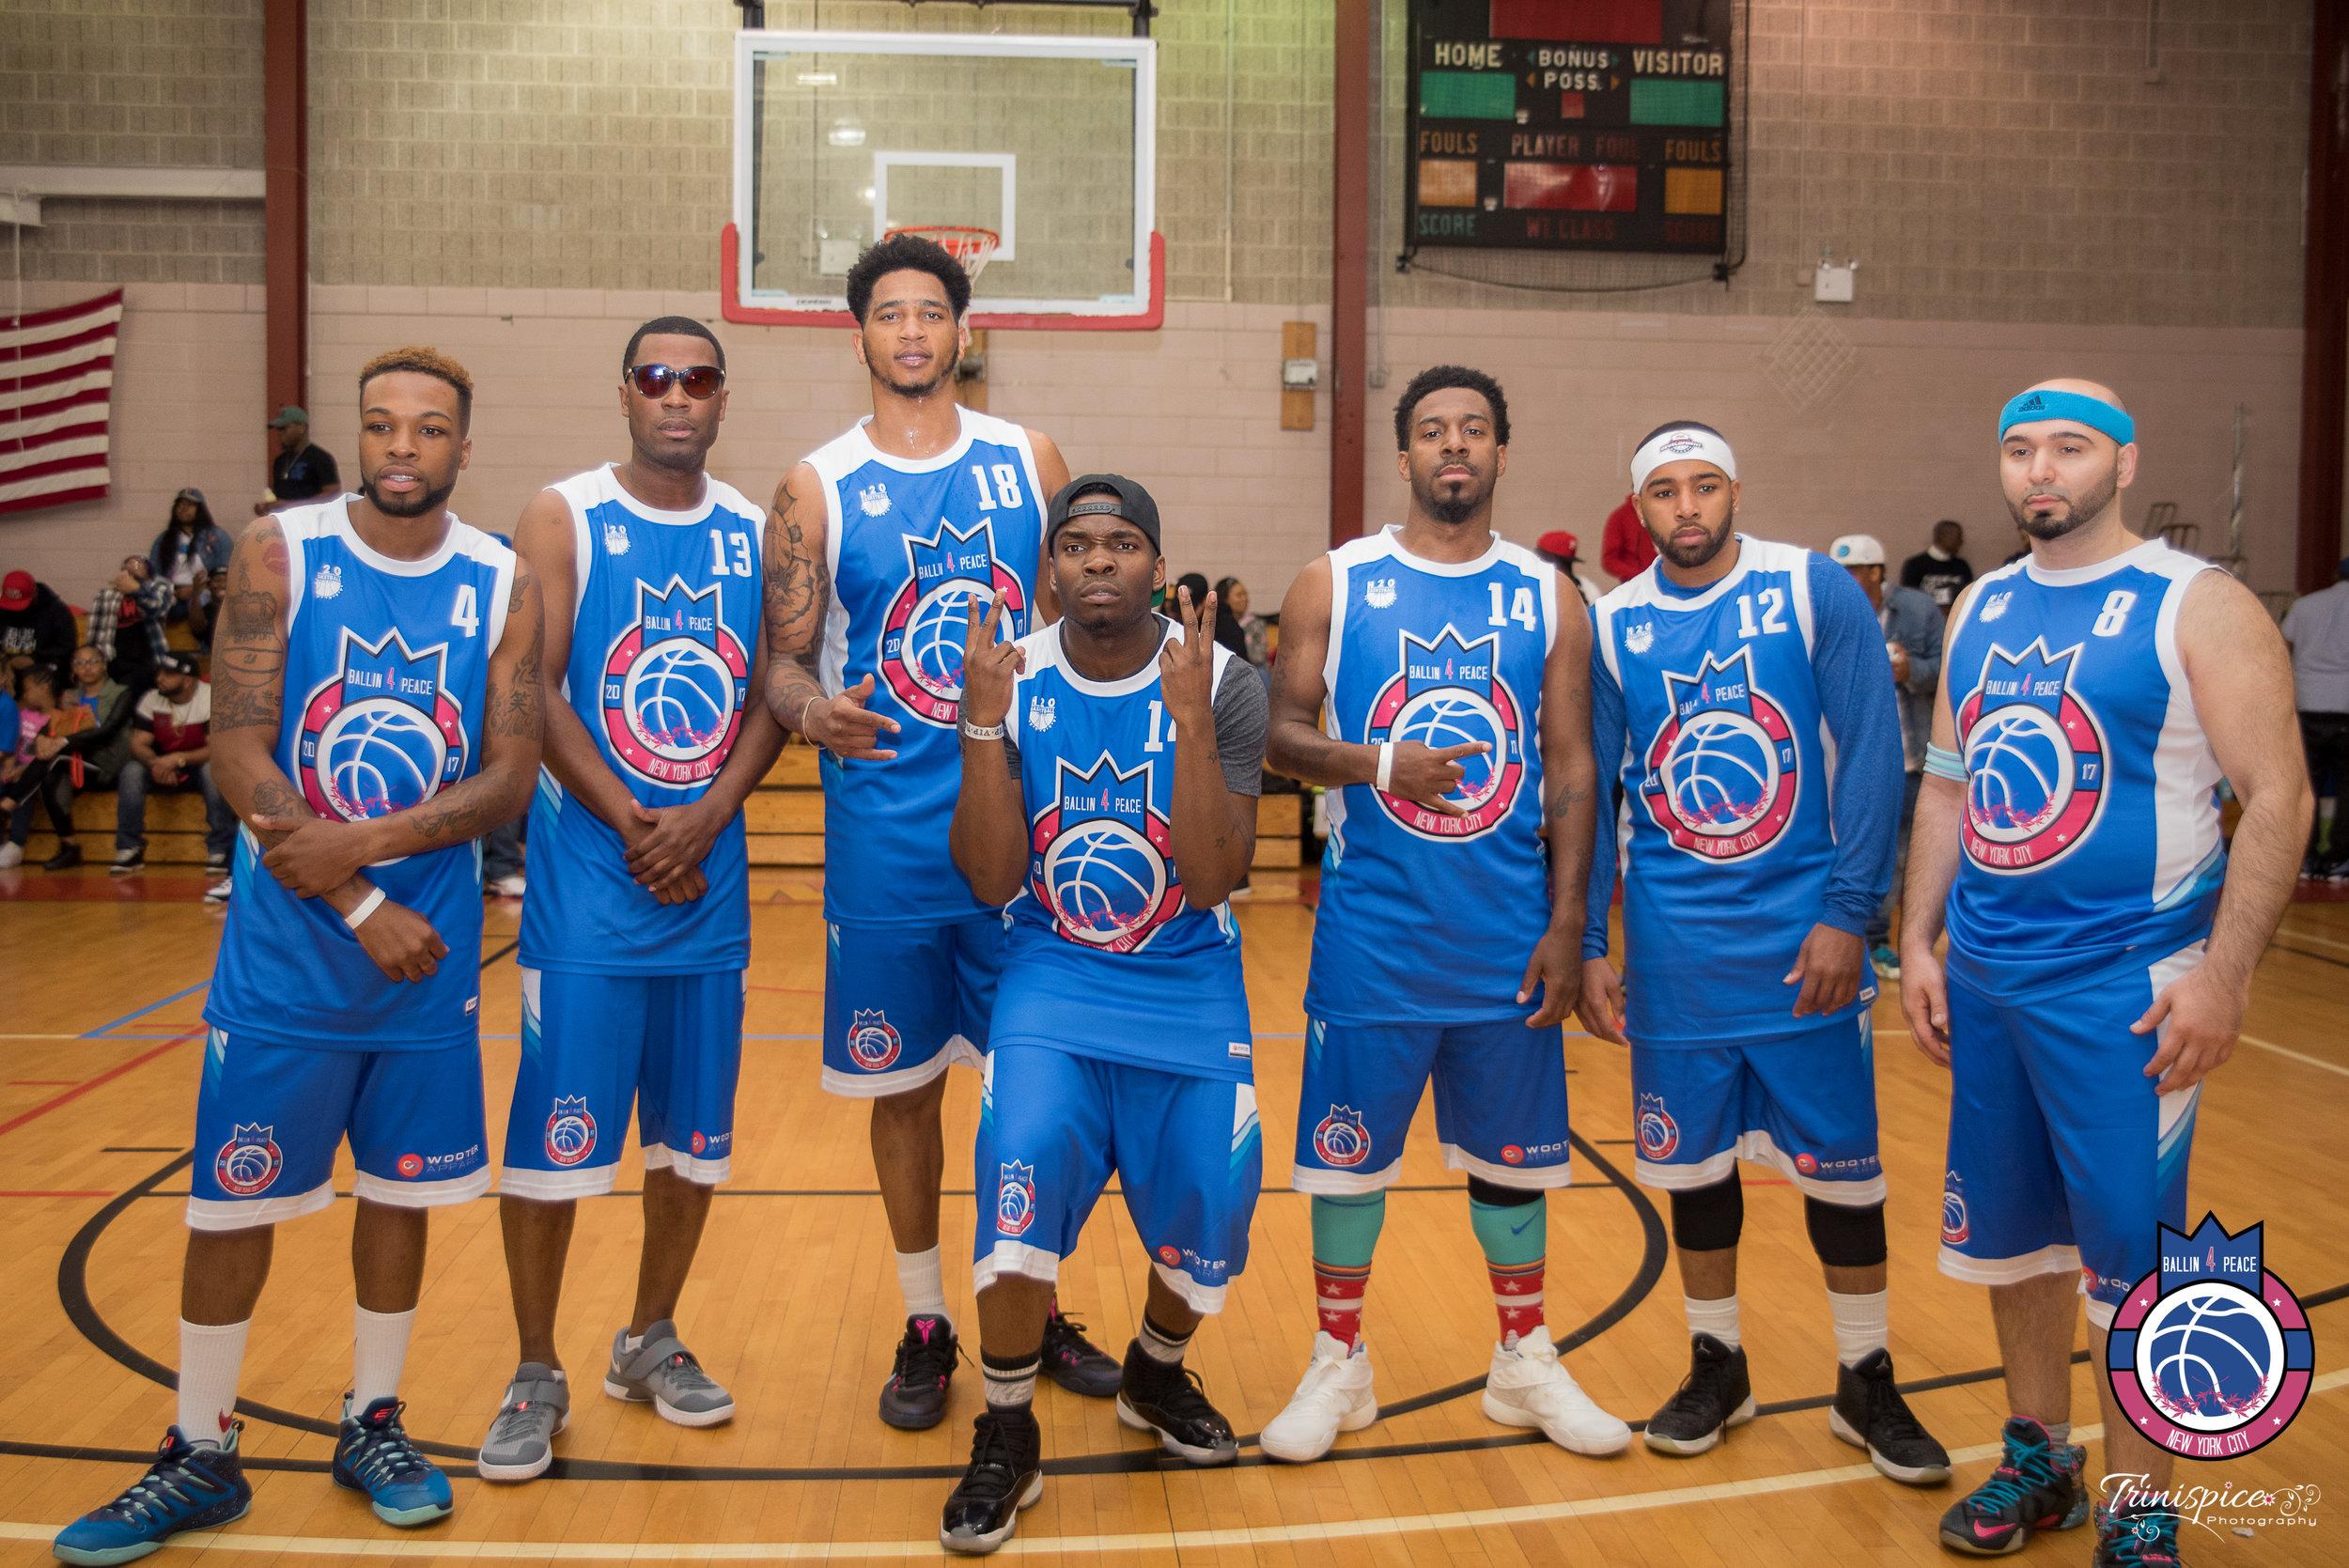 Blue red white VIP celeb basketball uniform jerseys shirts and shorts